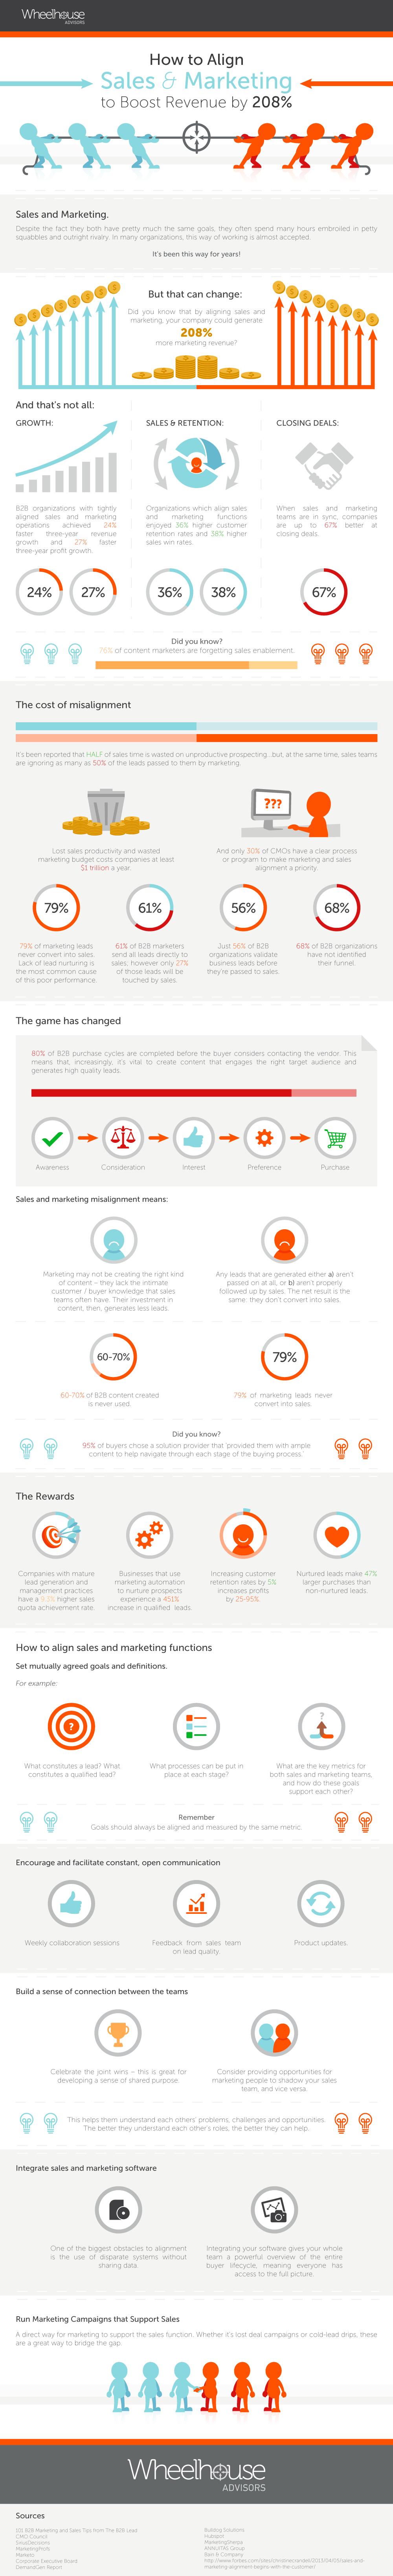 smarketing-infographic-wheelhouse.jpg